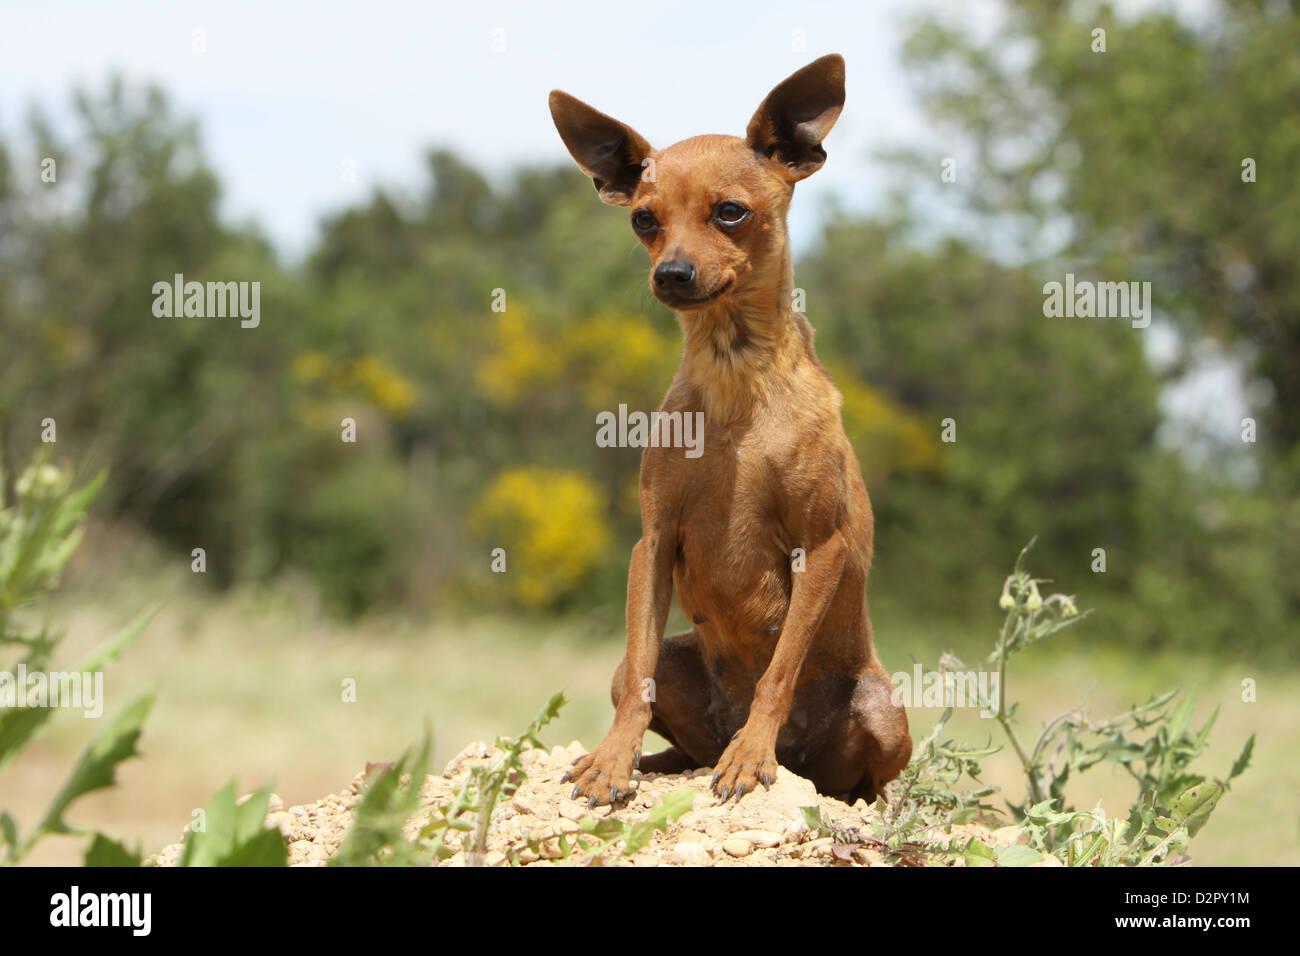 Dog Prazsky krysarik / Prague Ratter / Ratier de Prague  adult sitting on the ground Stock Photo